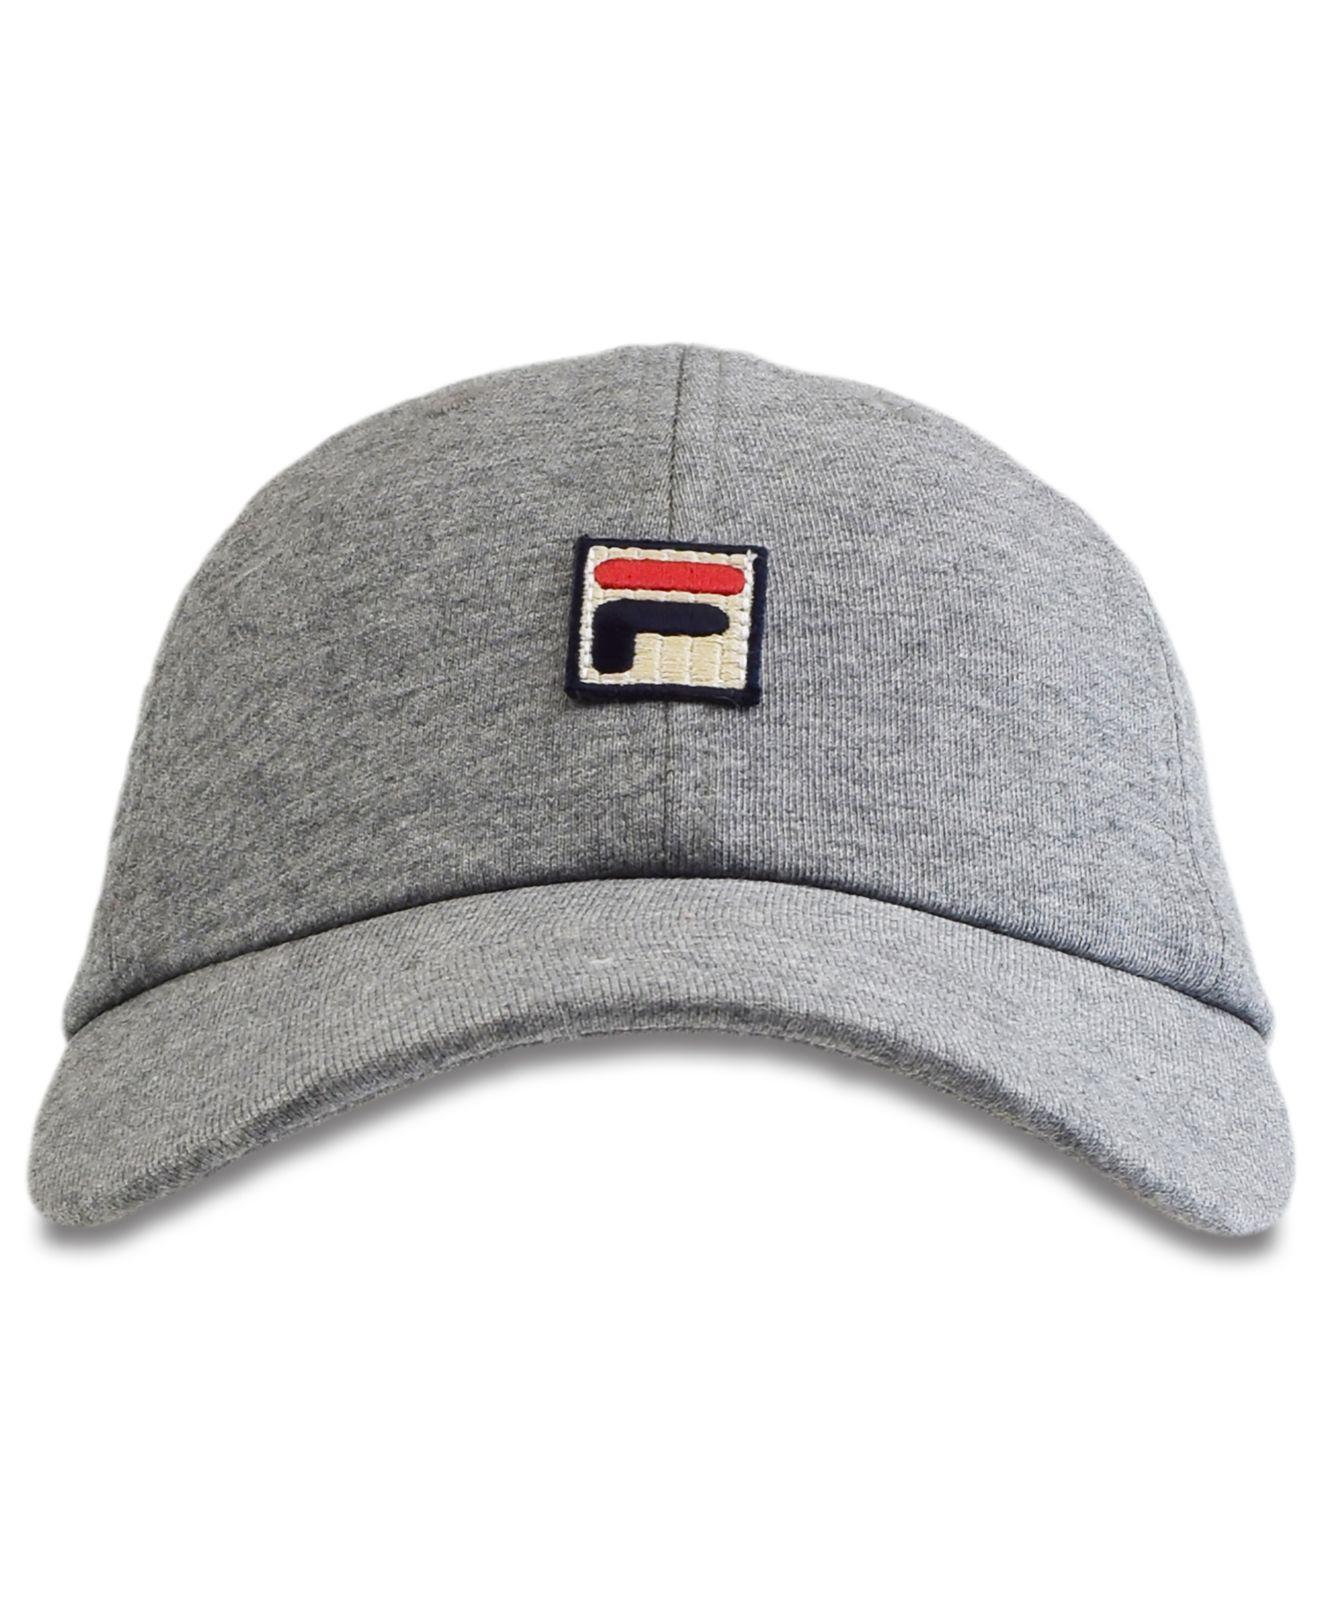 9630de96861 Lyst - Fila Cotton Baseball Cap in Gray - Save 28.0%